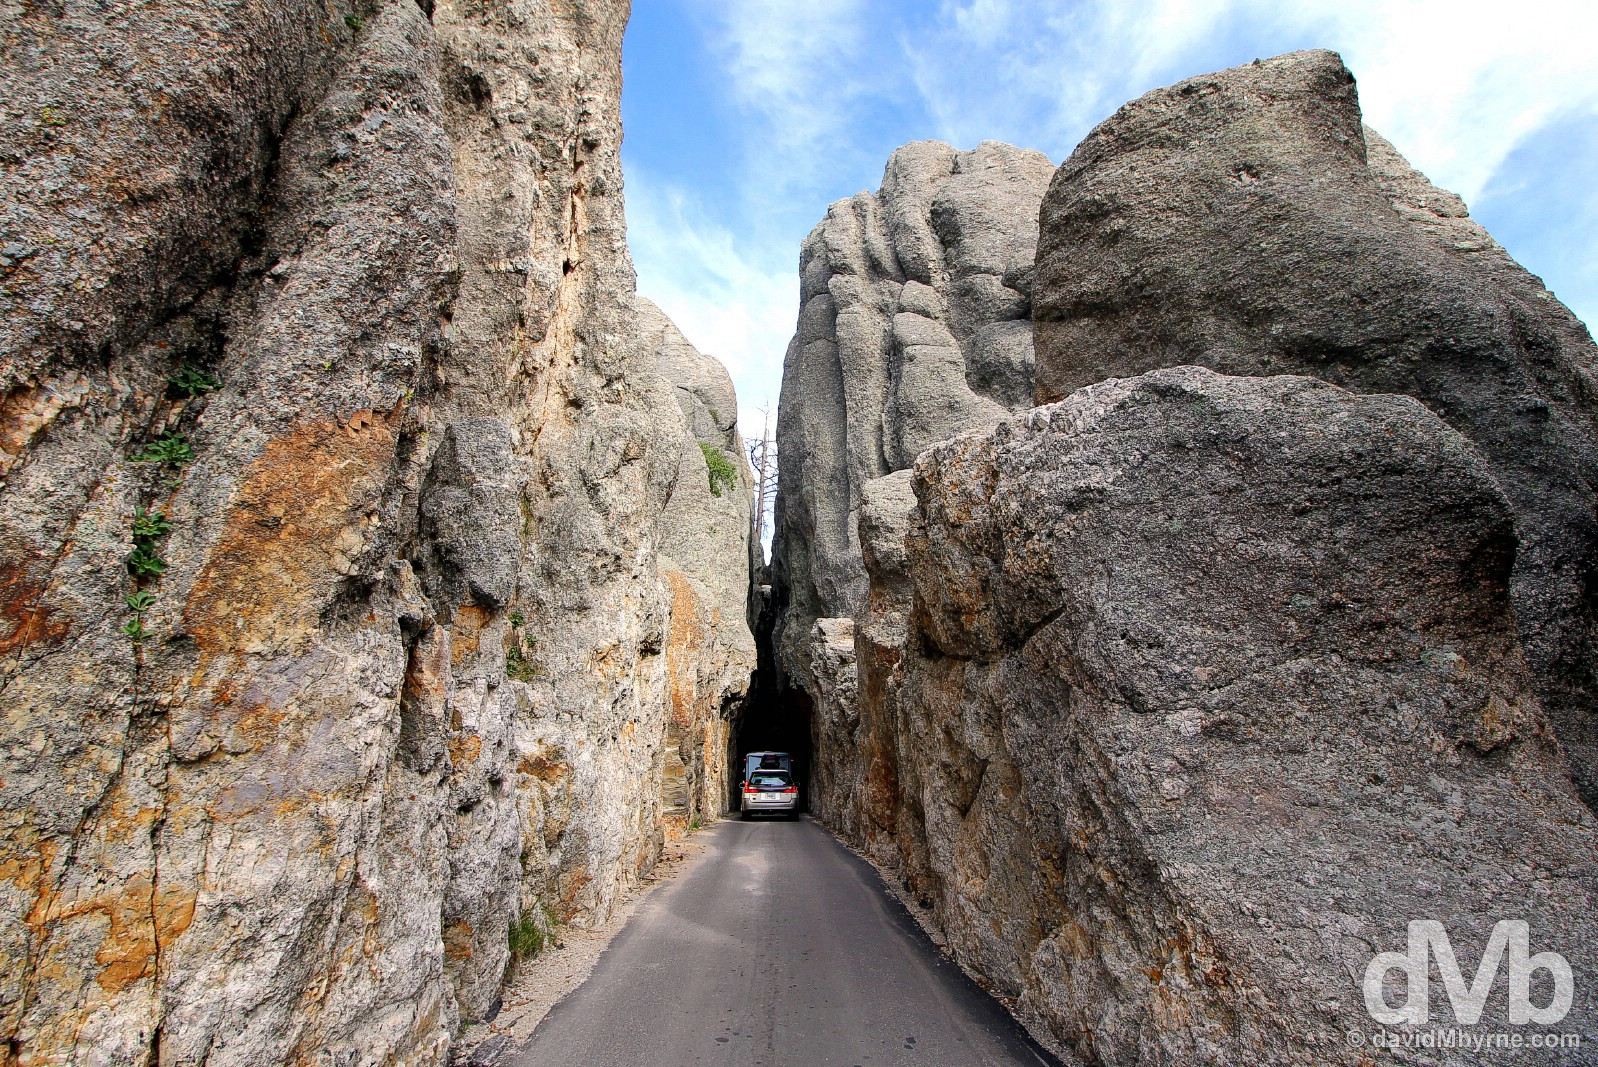 Tackling the Needles Eye Tunnel of the Needles Highway of Custer State Park, Black Hills, South Dakota. September 2, 2016.